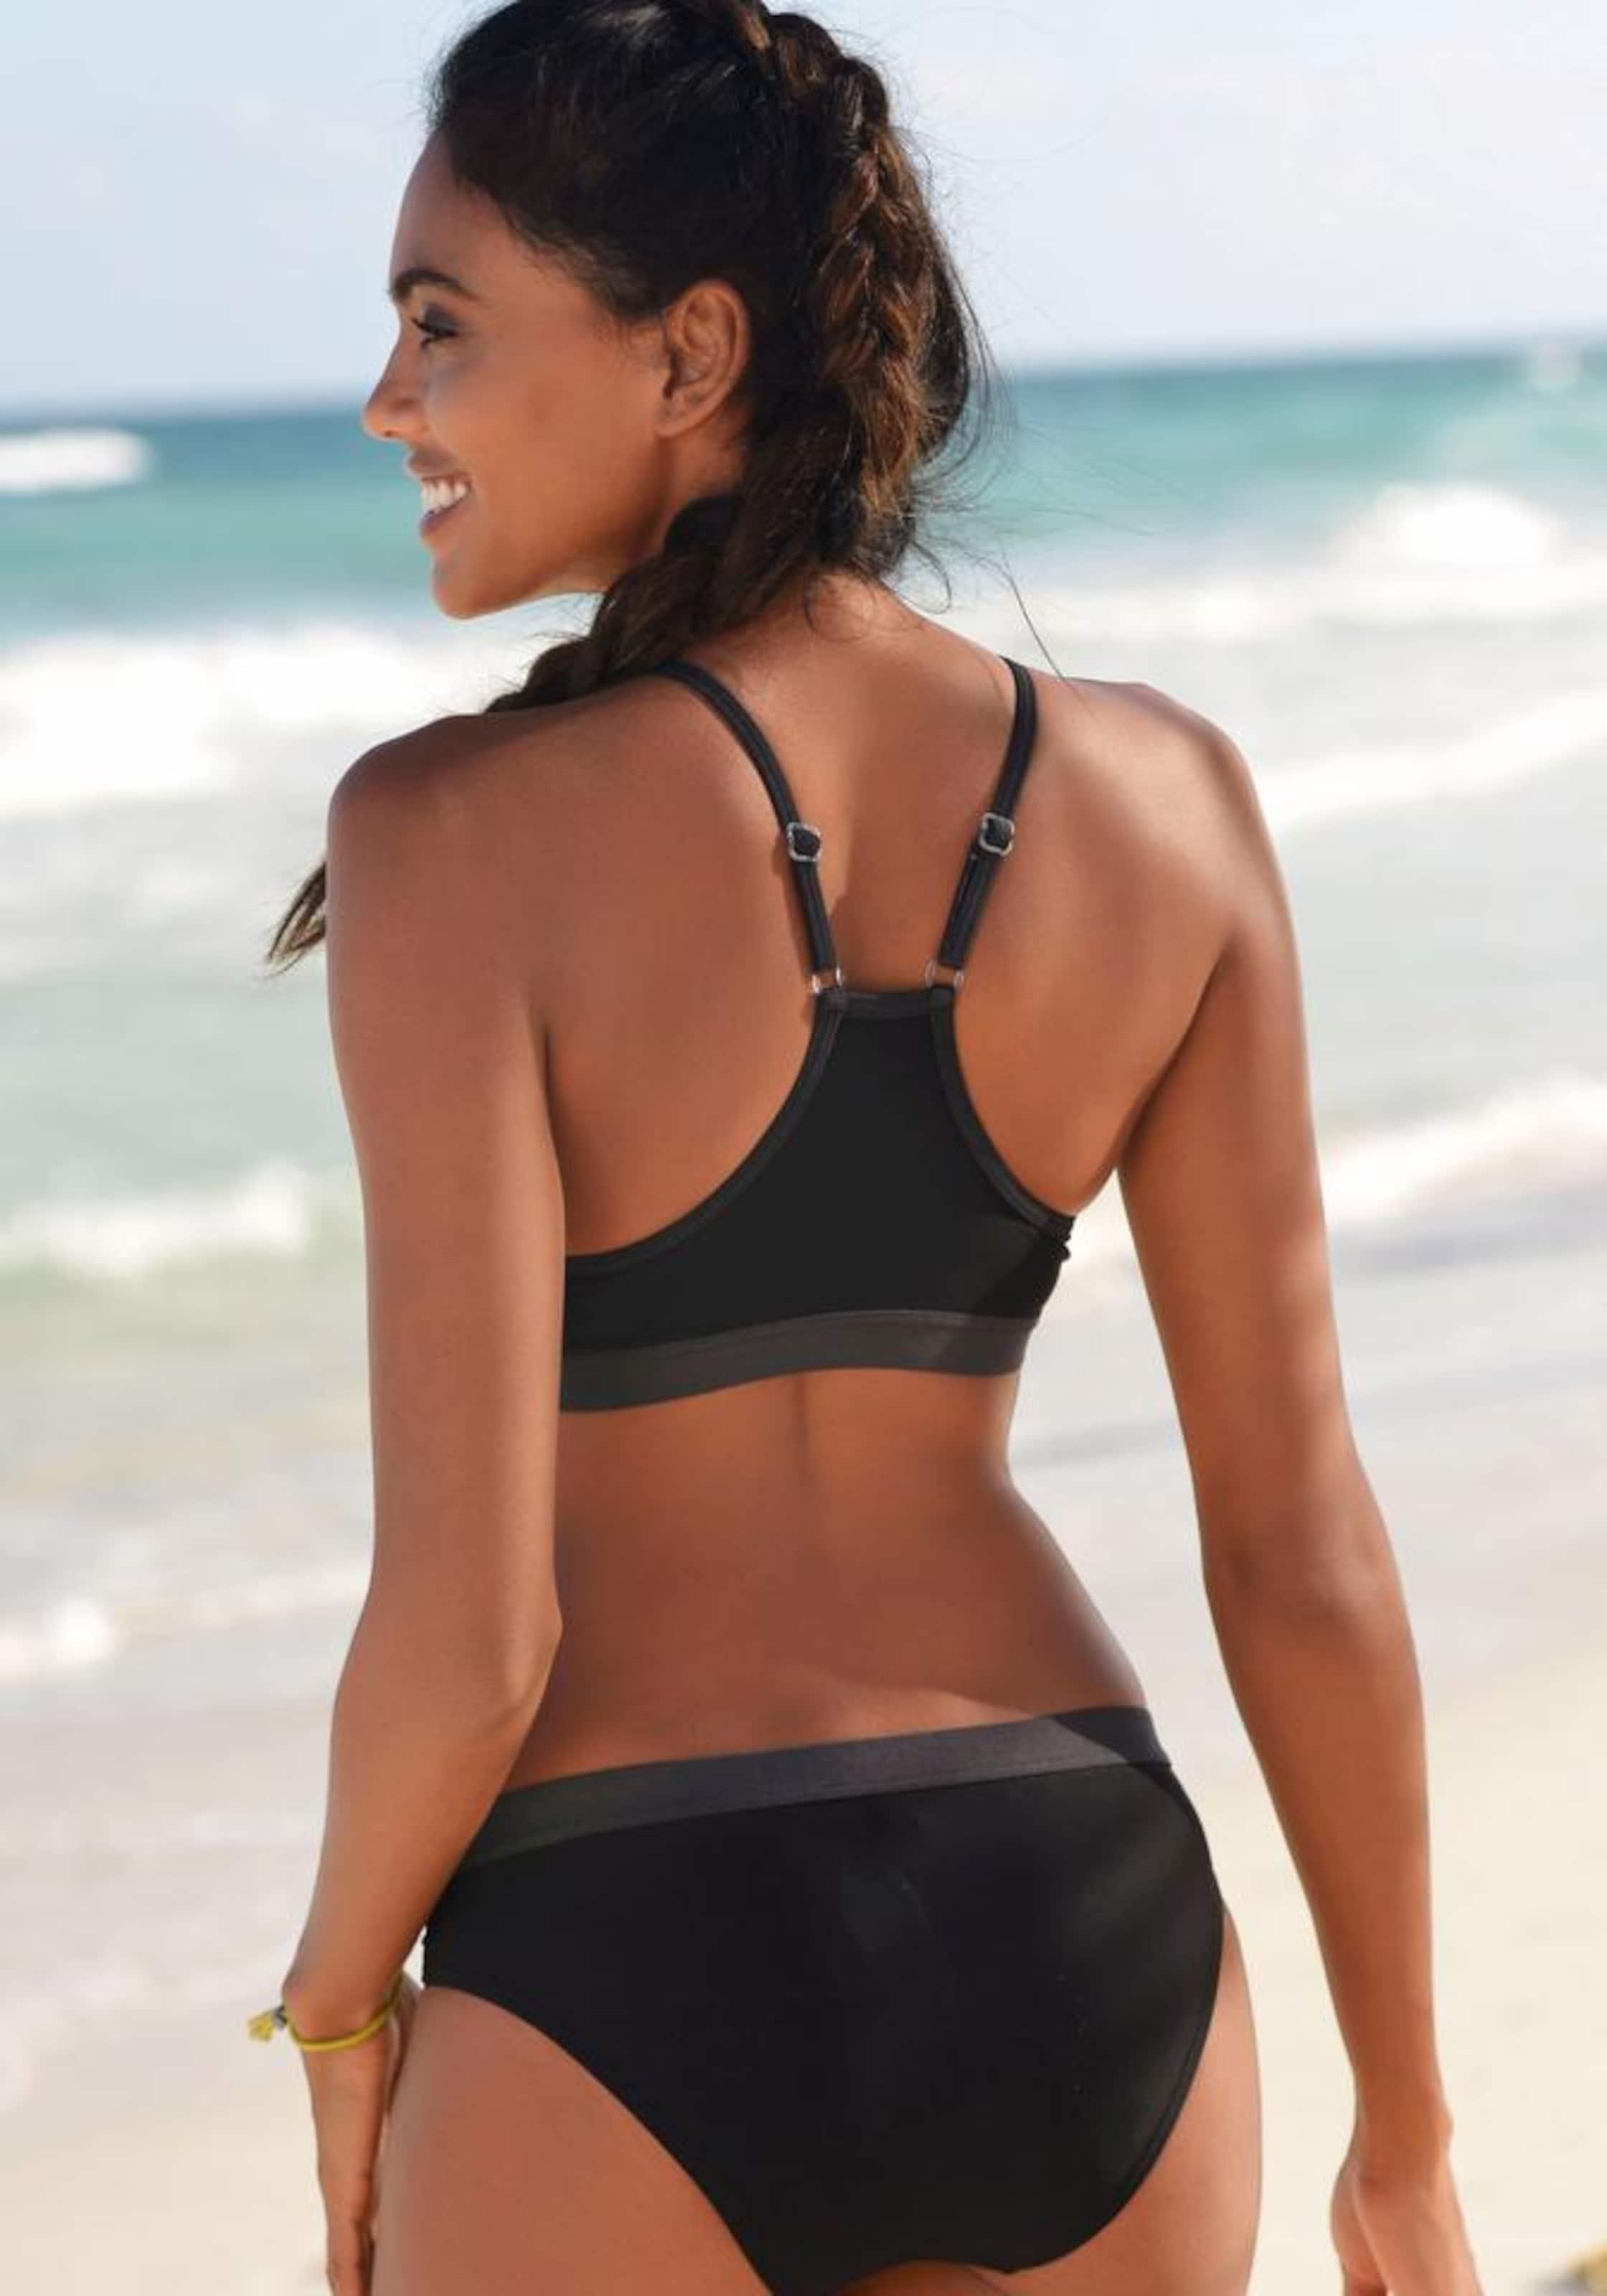 Venice Beach Bustier bikini Anthrazit In eEHW29IbDY